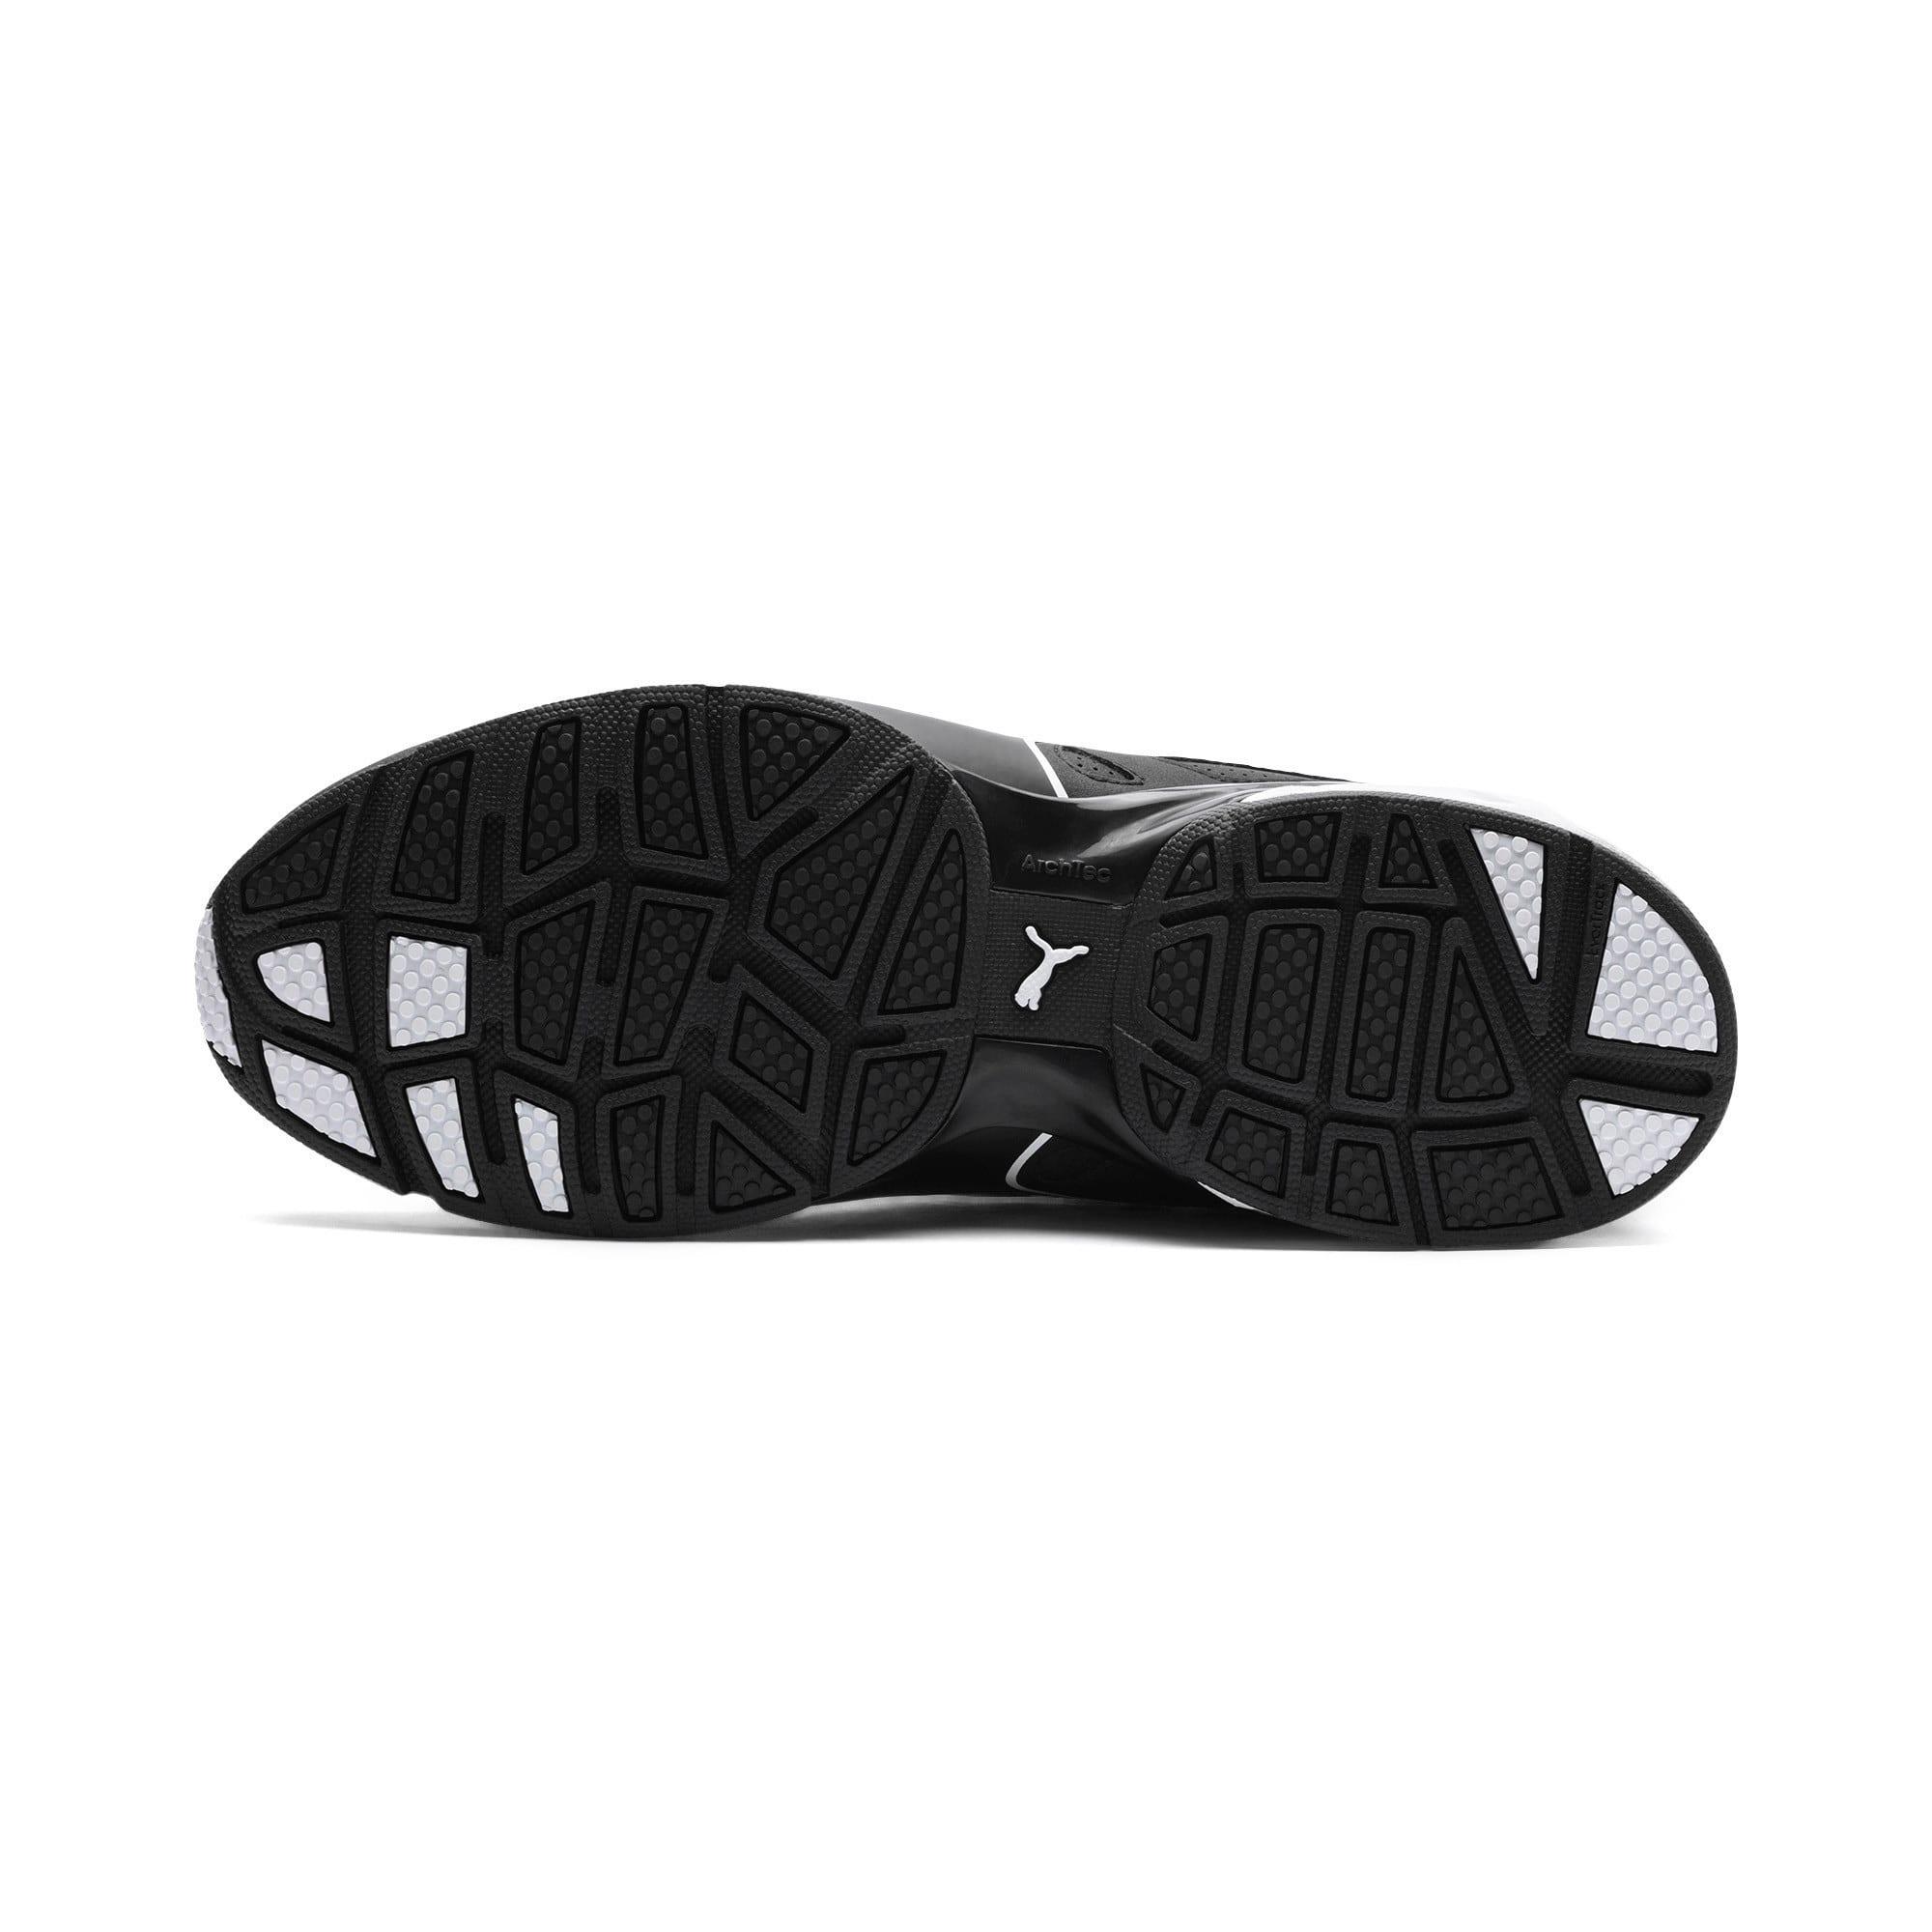 Thumbnail 5 of Tazon Modern SL Men's Running Shoes, Puma Black-Puma White, medium-IND